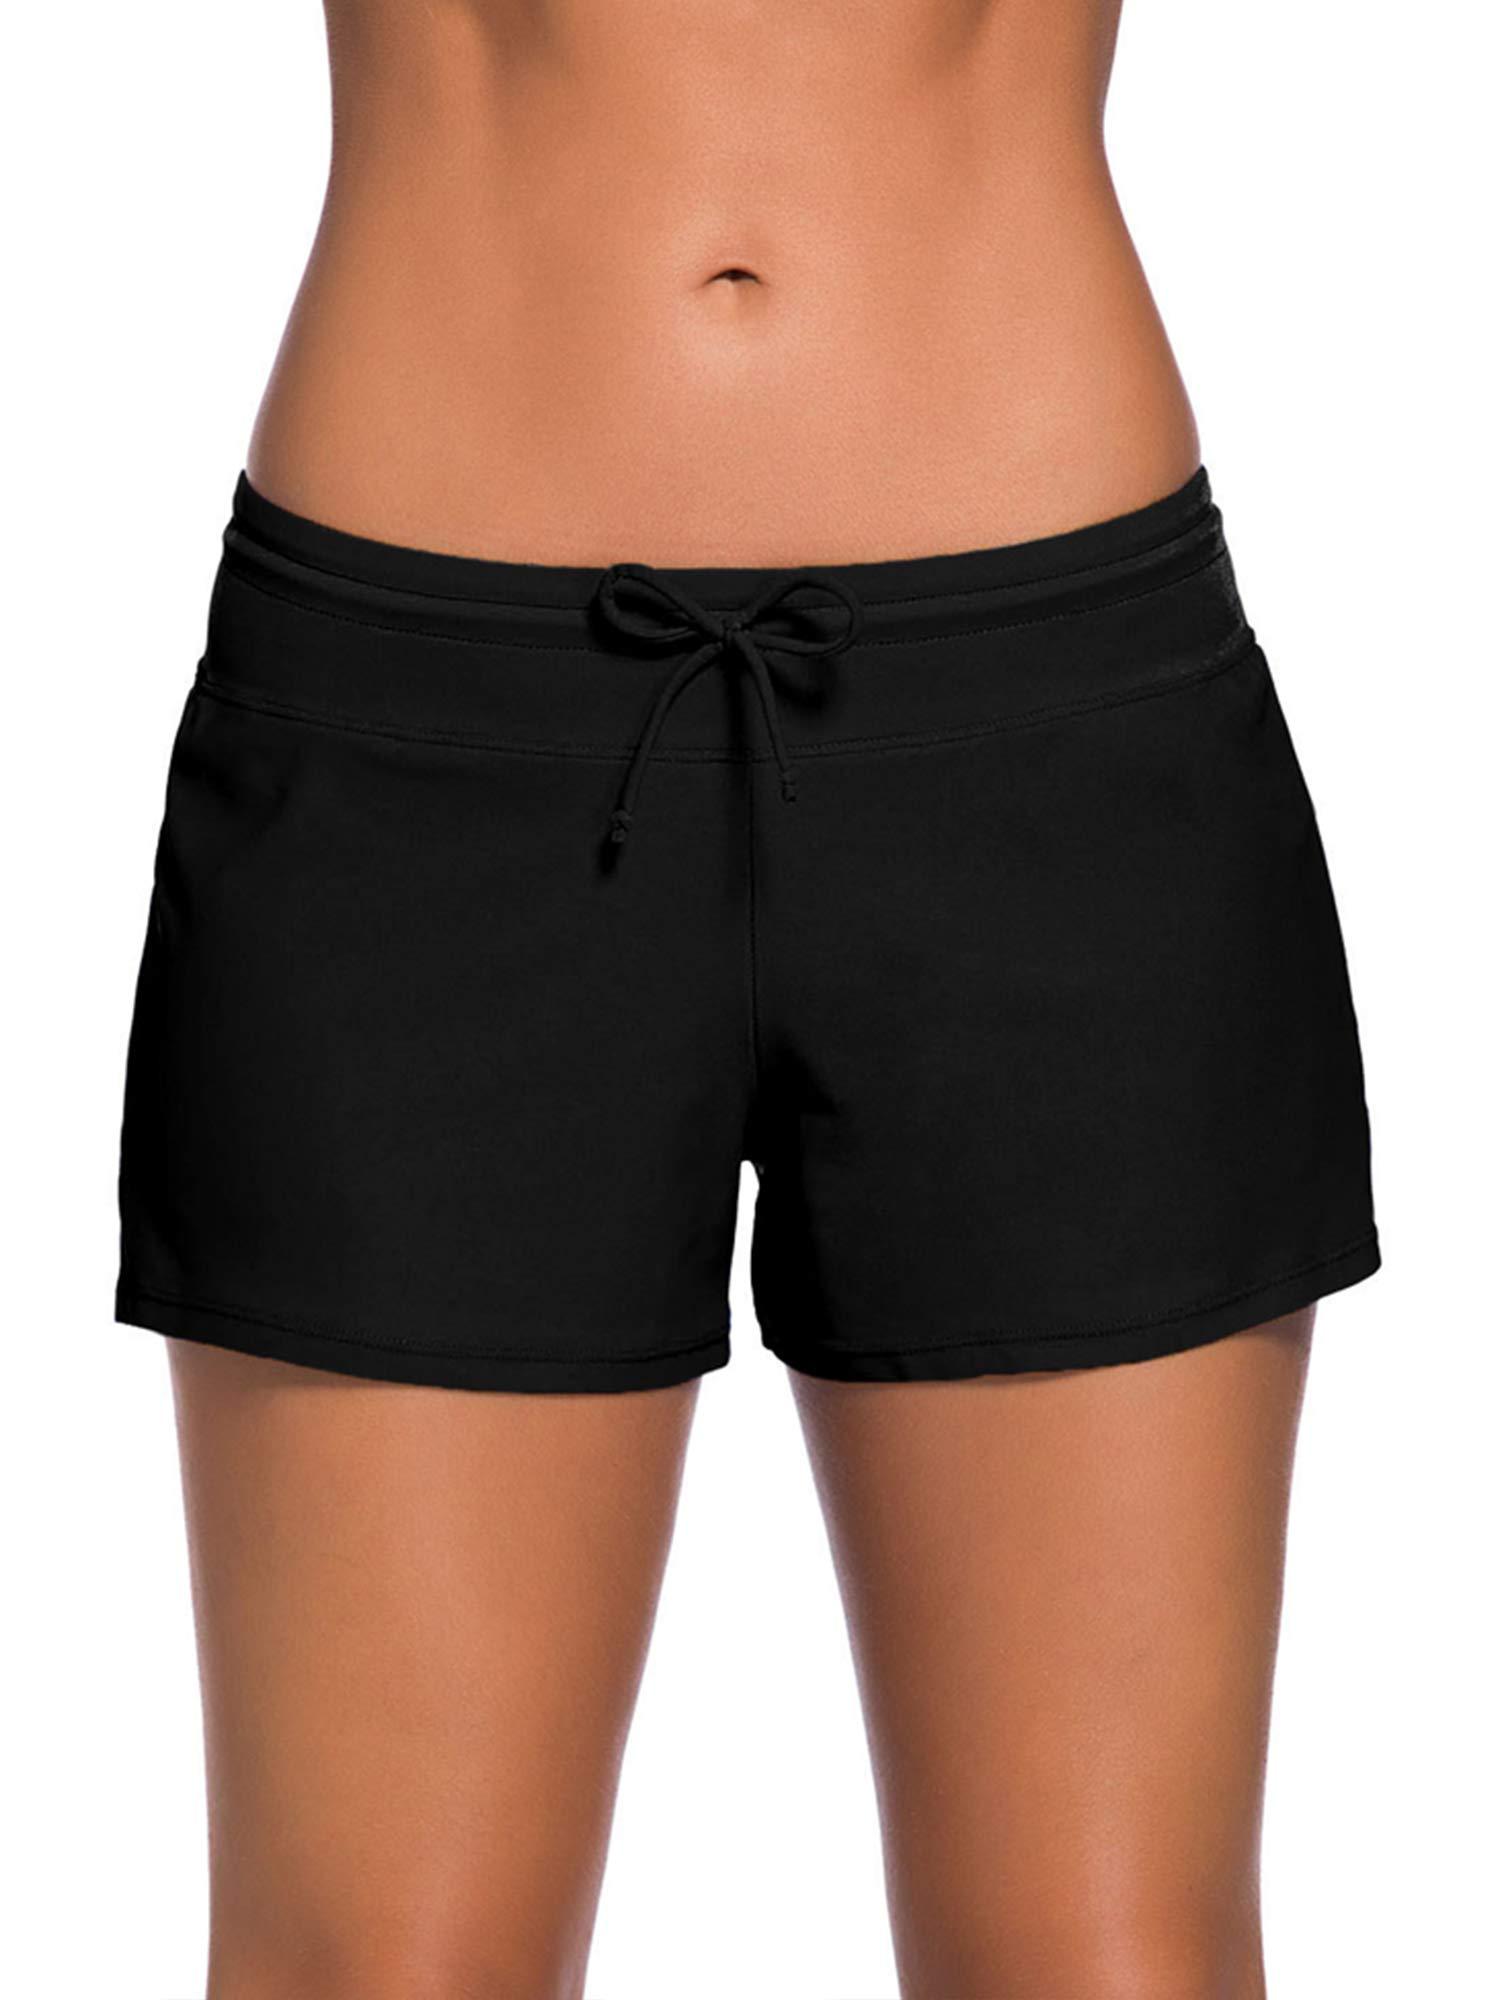 WILLBOND Women Swimsuit Shorts Tankini Swim Briefs Side Split Plus Size  Bottom Boardshort Summer Beach Swimwear bc3091393